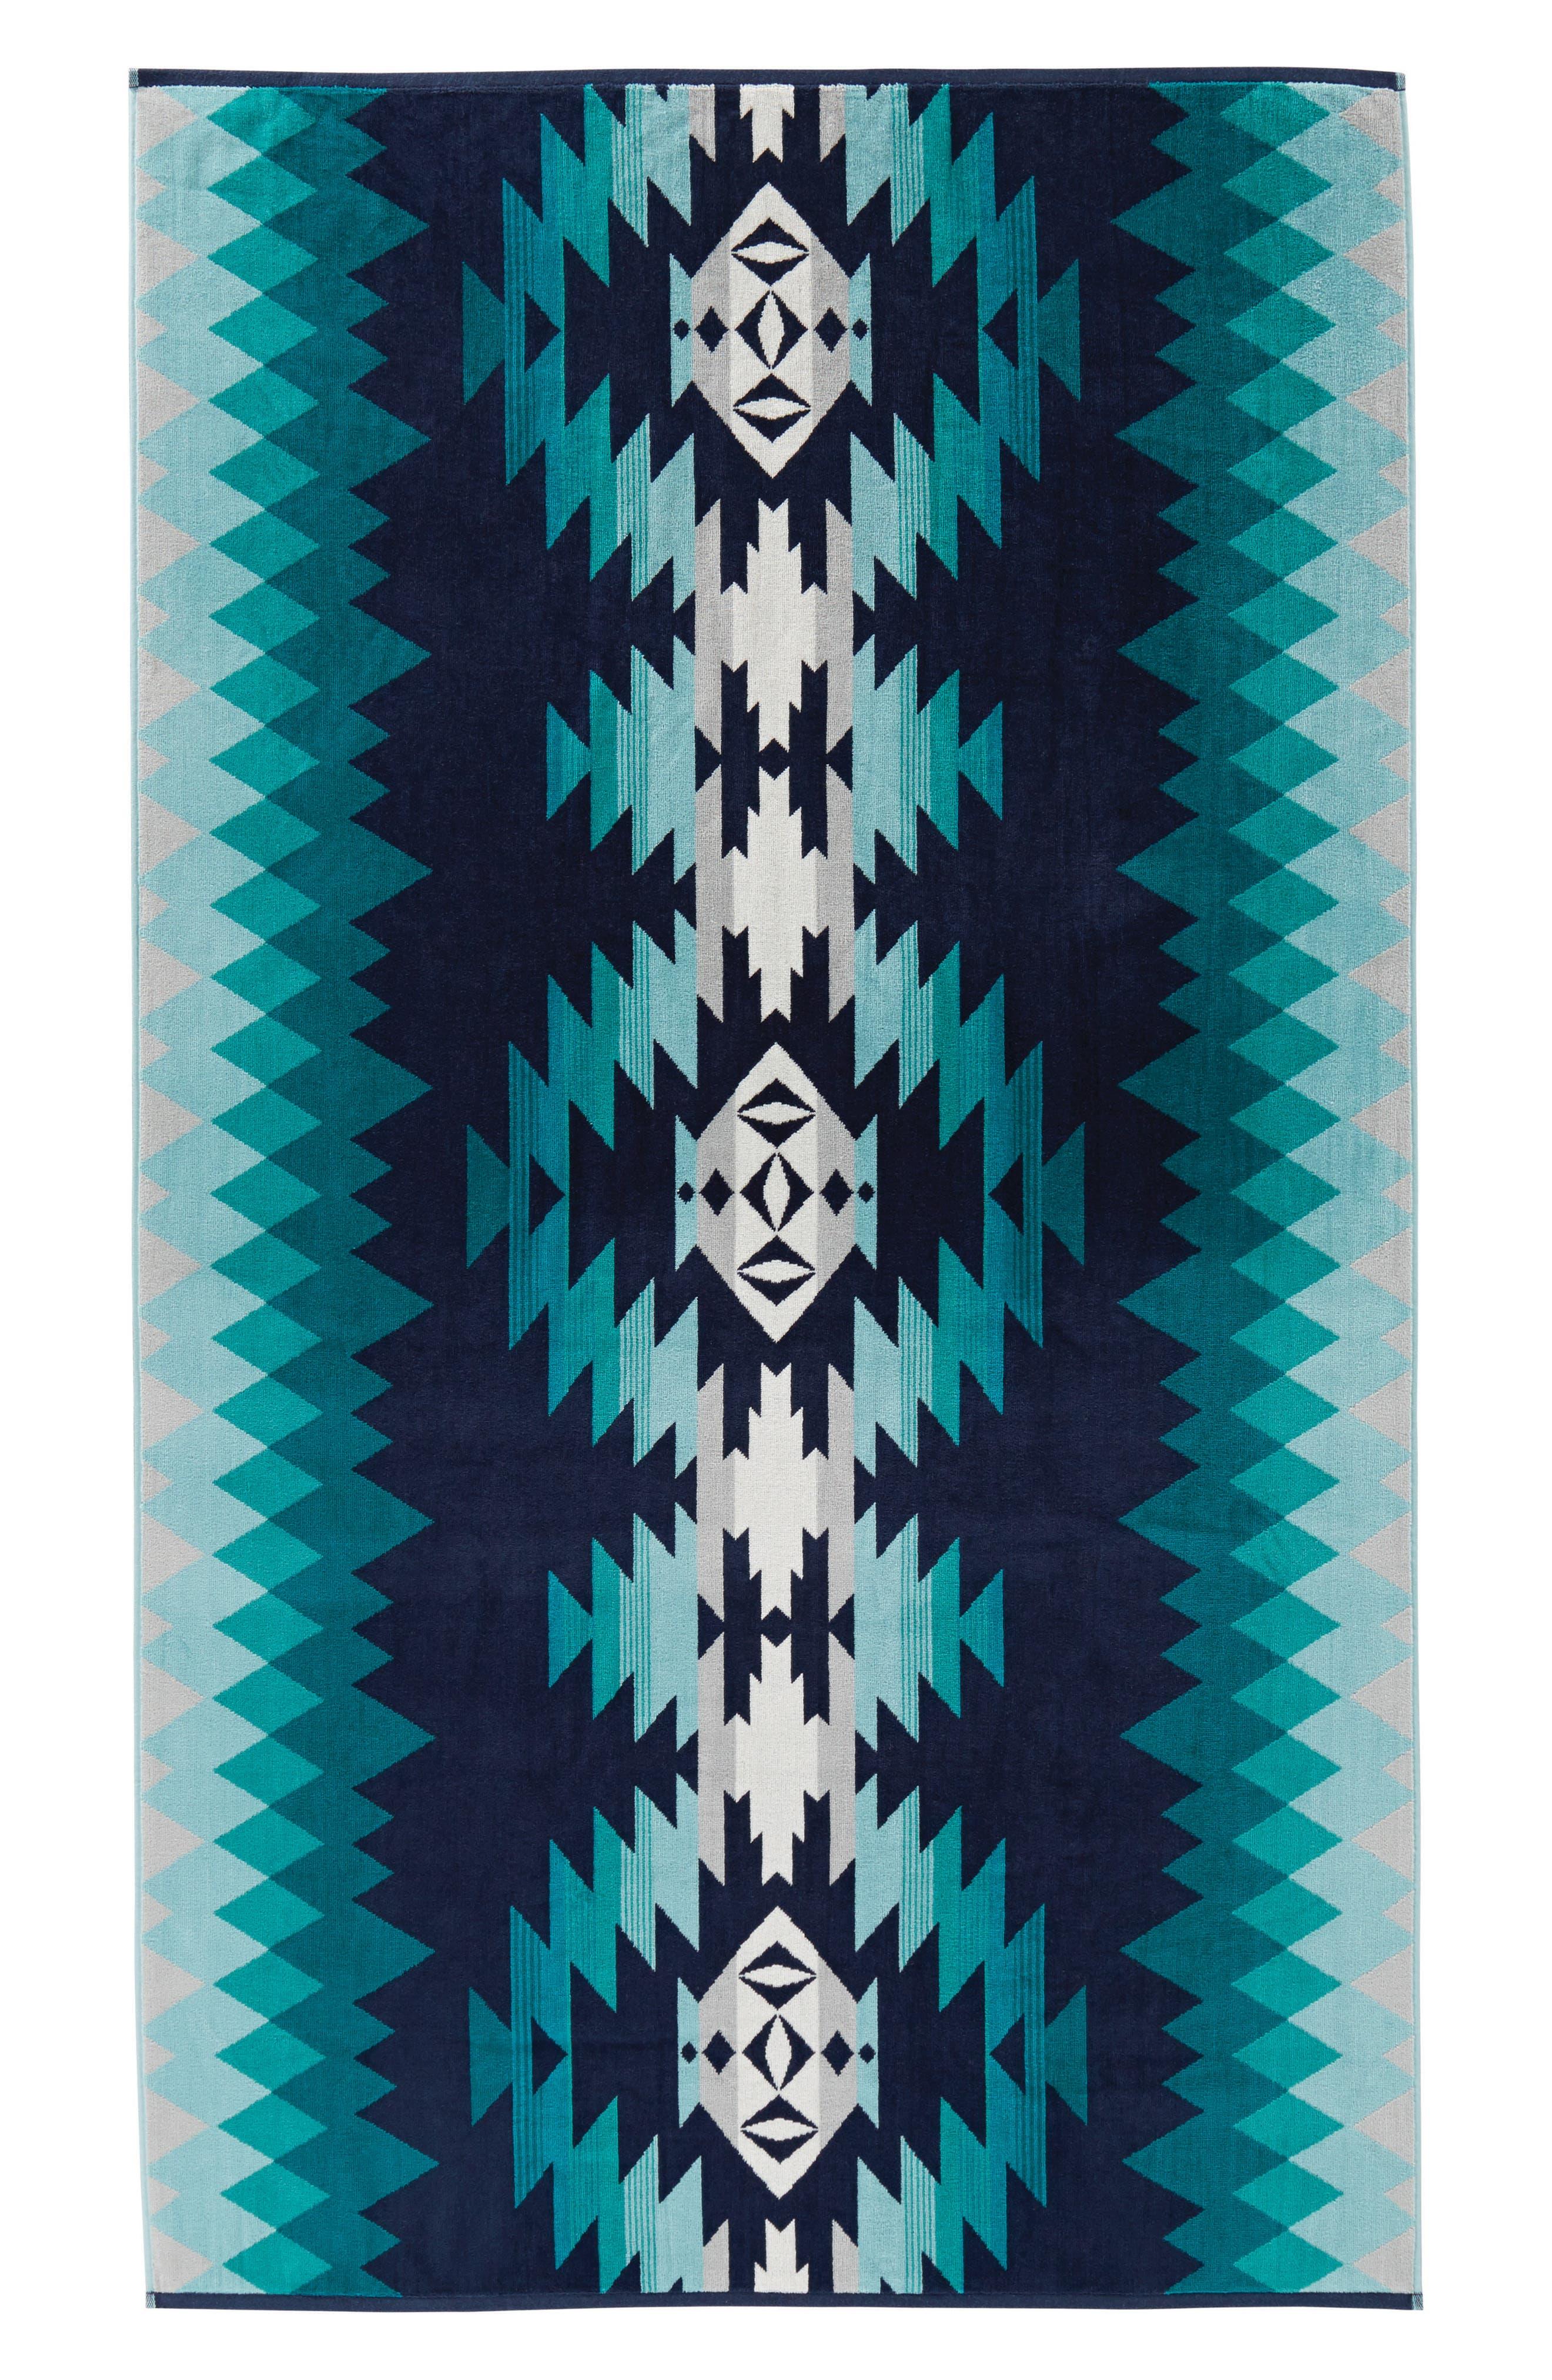 Papago Park Spa Towel,                             Main thumbnail 1, color,                             Blue Multi